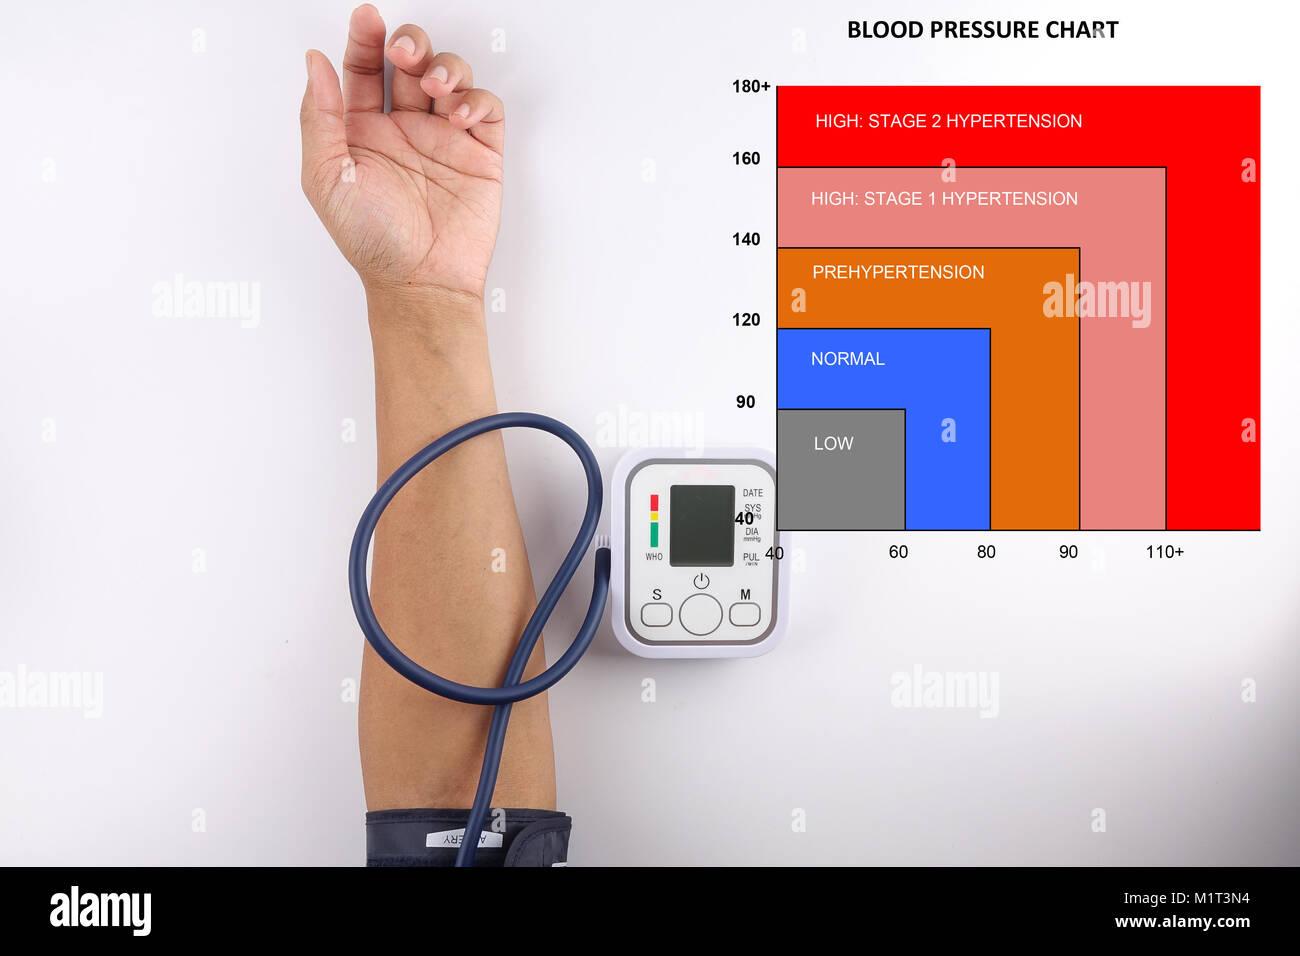 Blood pressure chart with blood pressure meter stock photo royalty blood pressure chart with blood pressure meter geenschuldenfo Choice Image